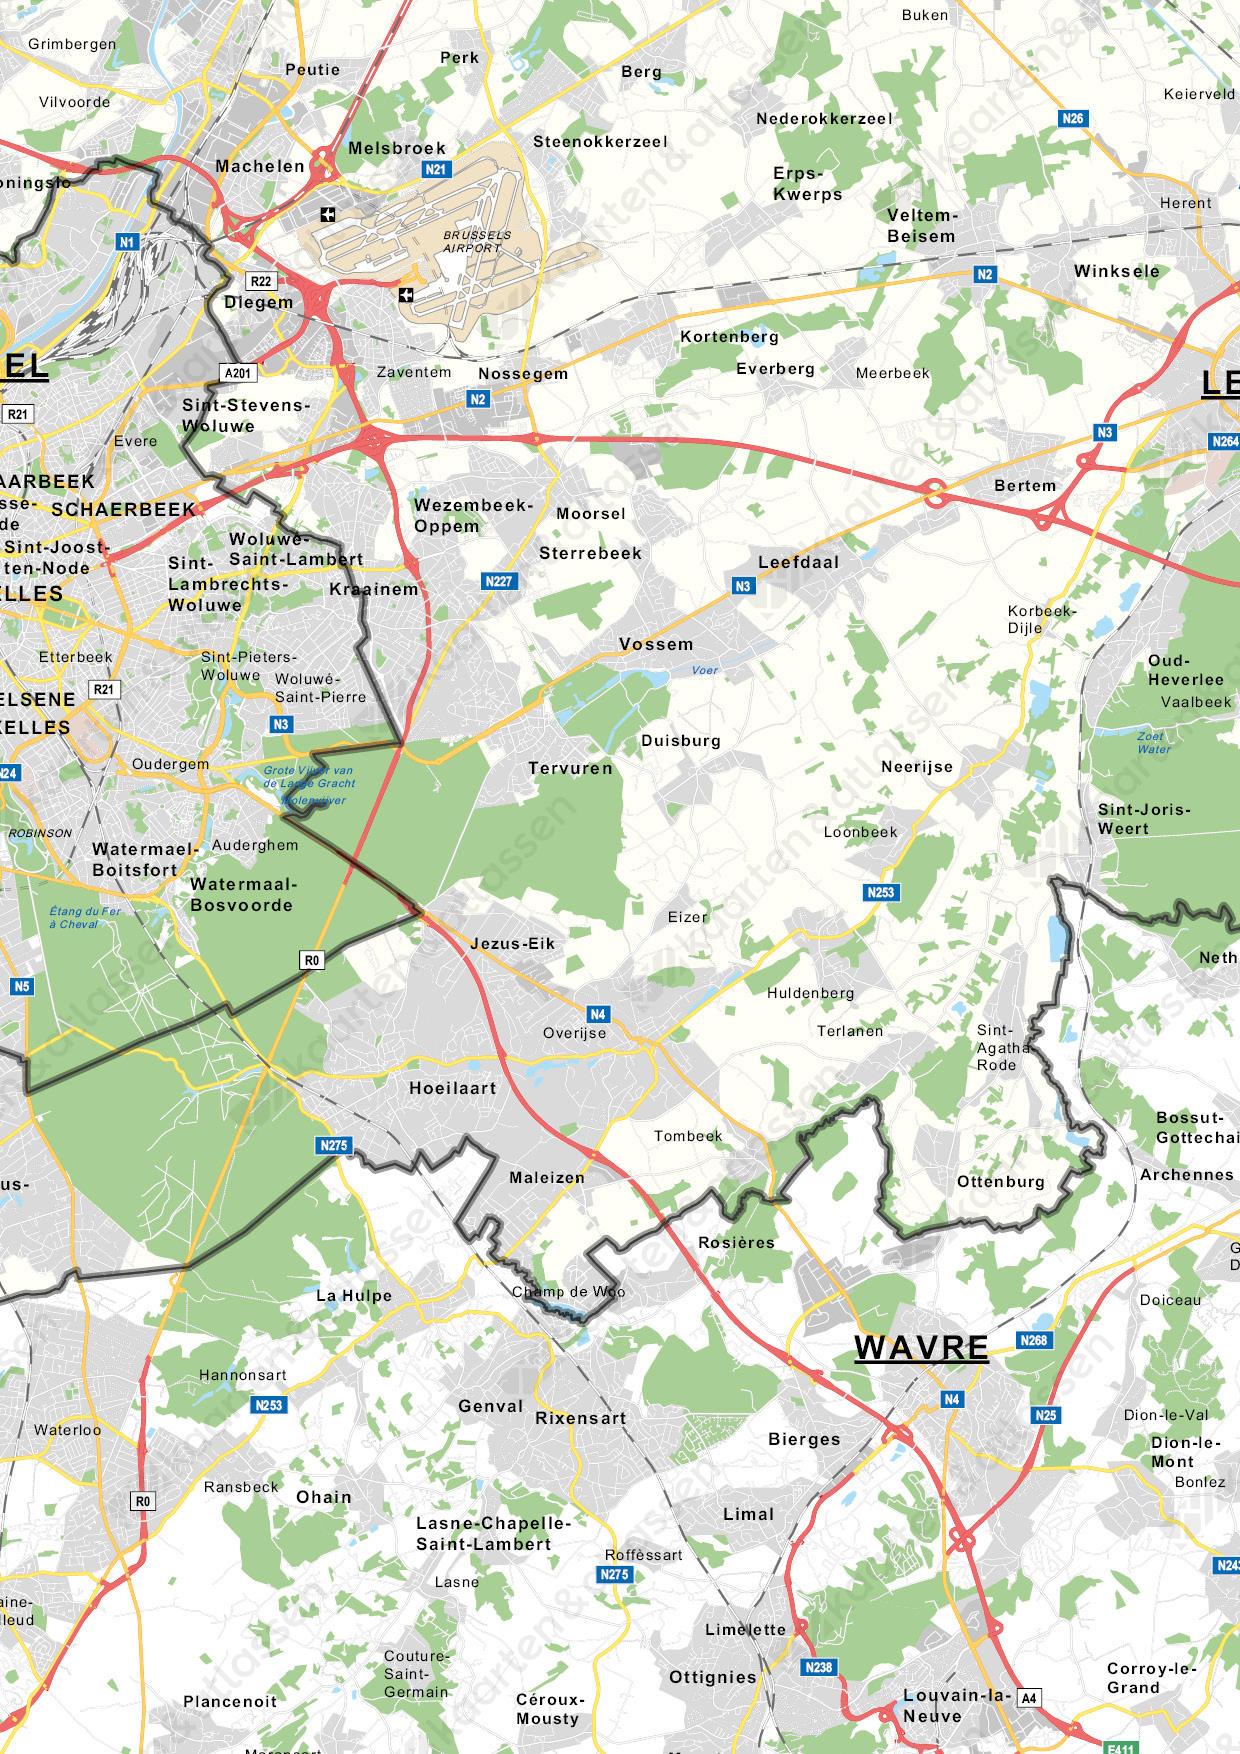 Vlaams-Brabant Provinciekaart